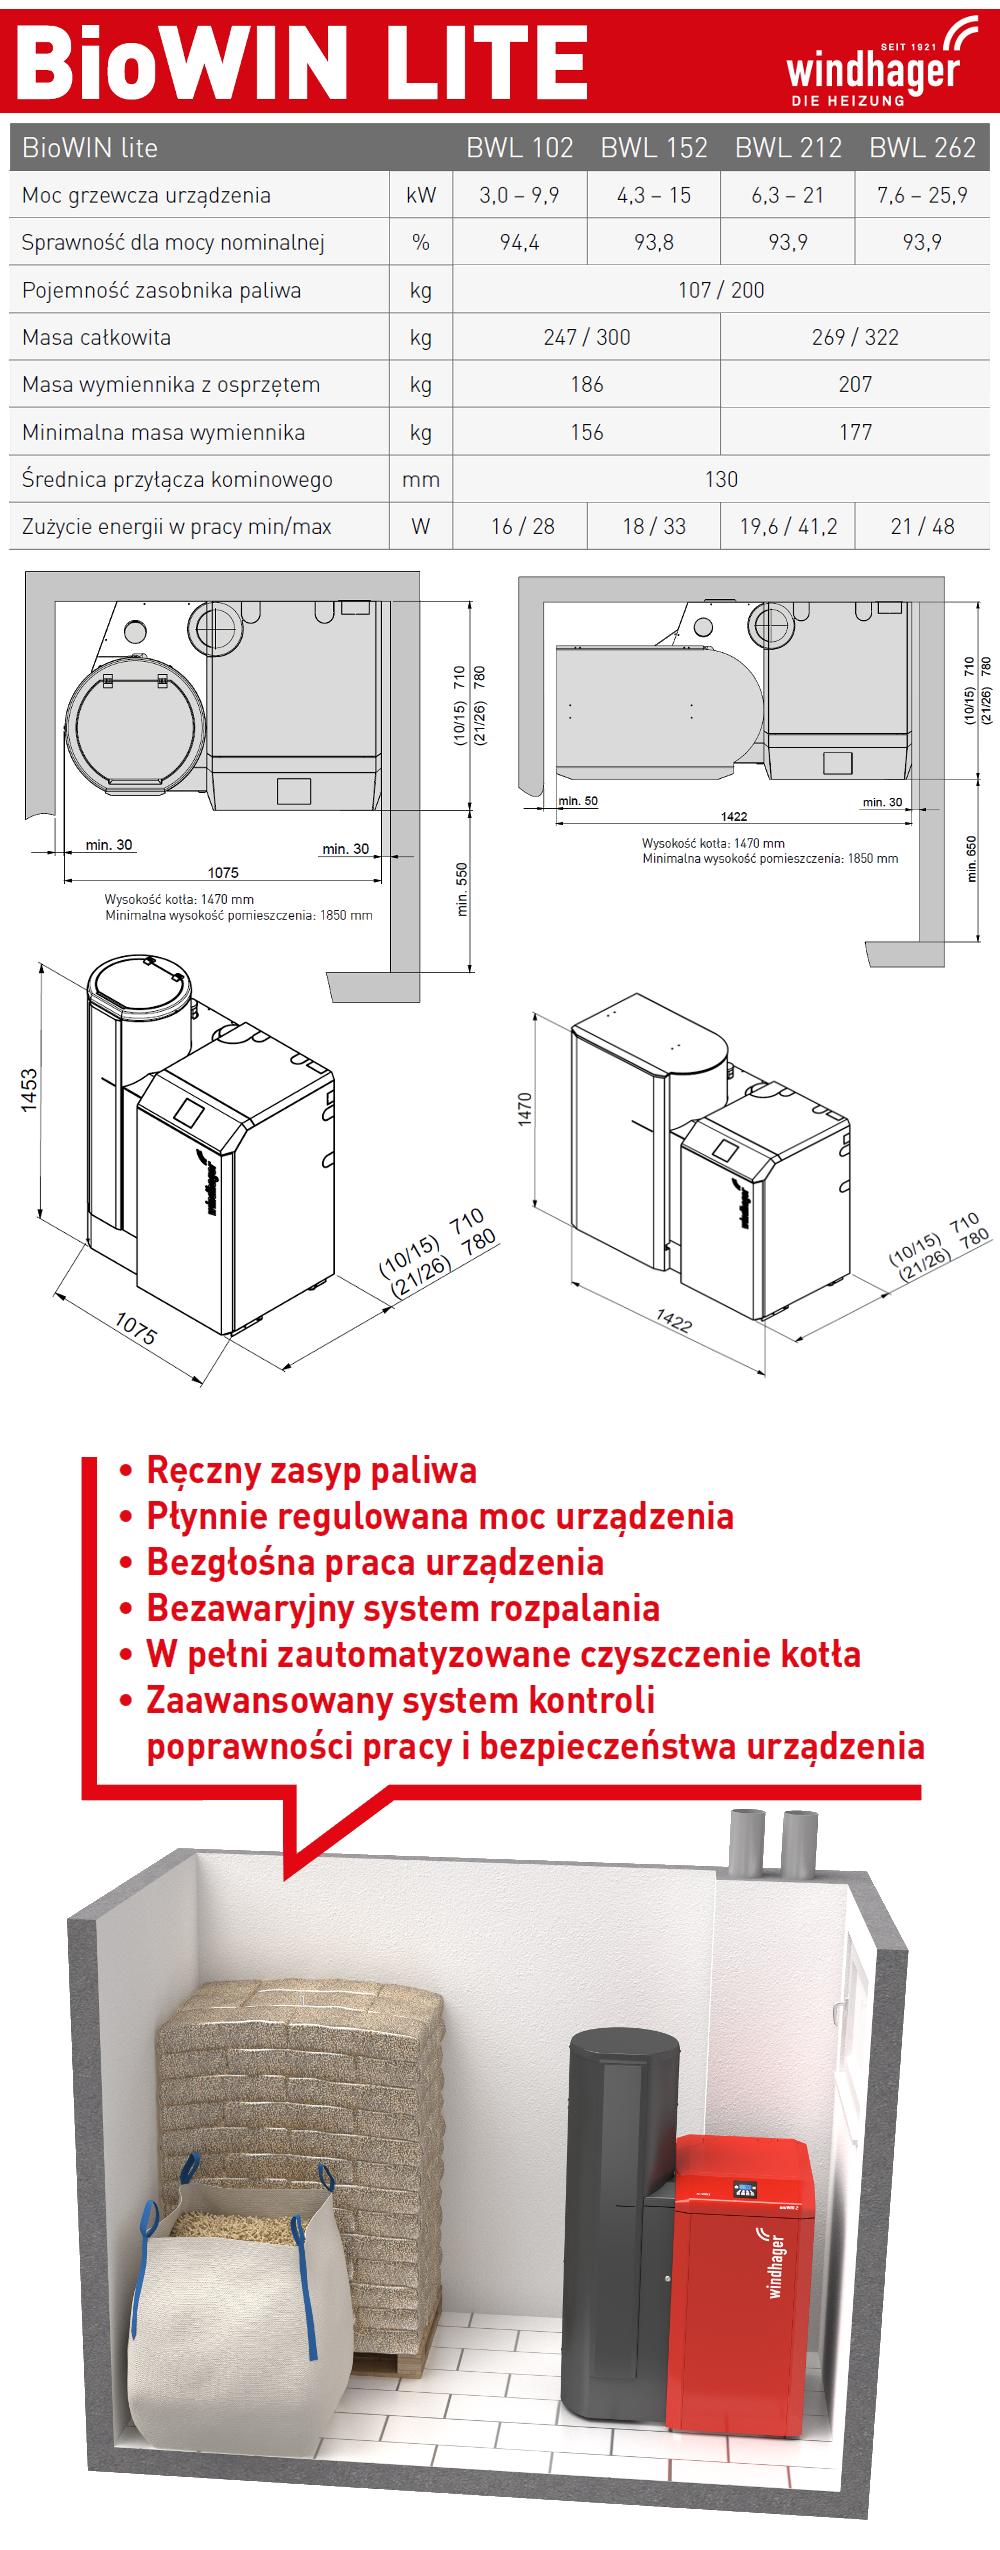 Parametry kotła Windhager BioWIN Lite